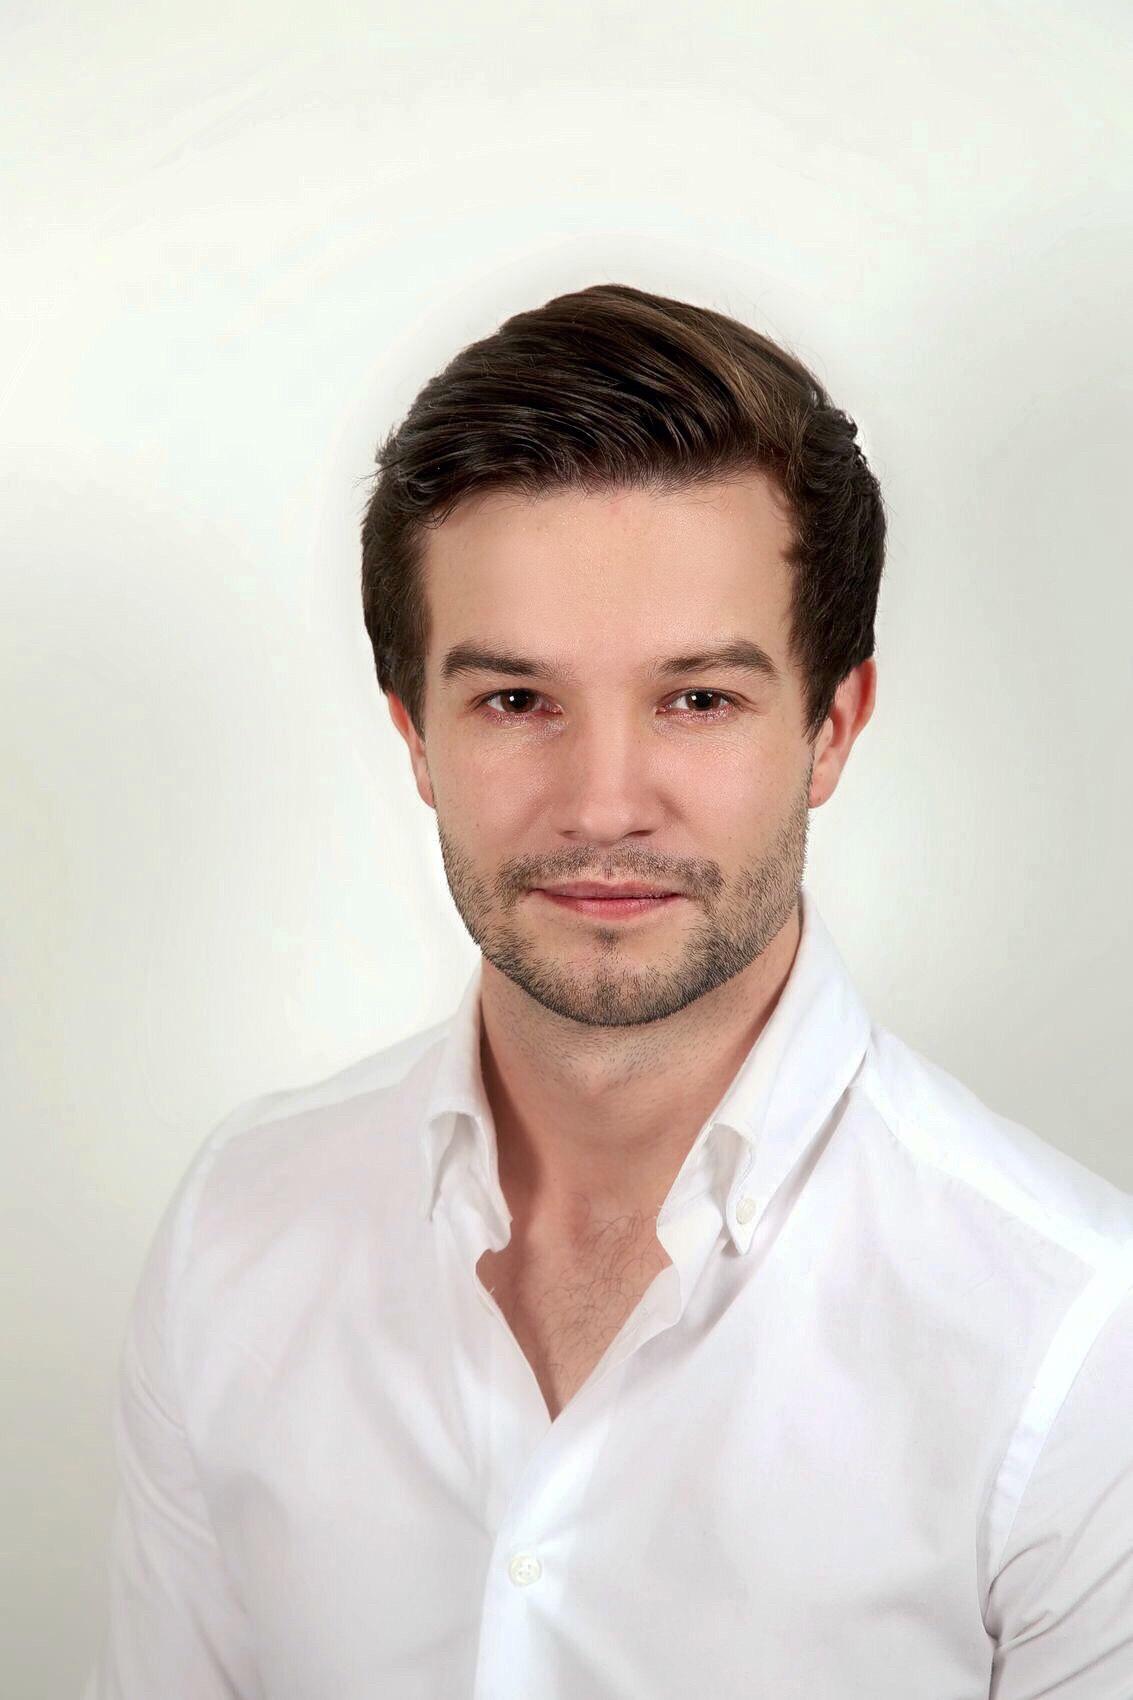 Luke Nicholas Taylor